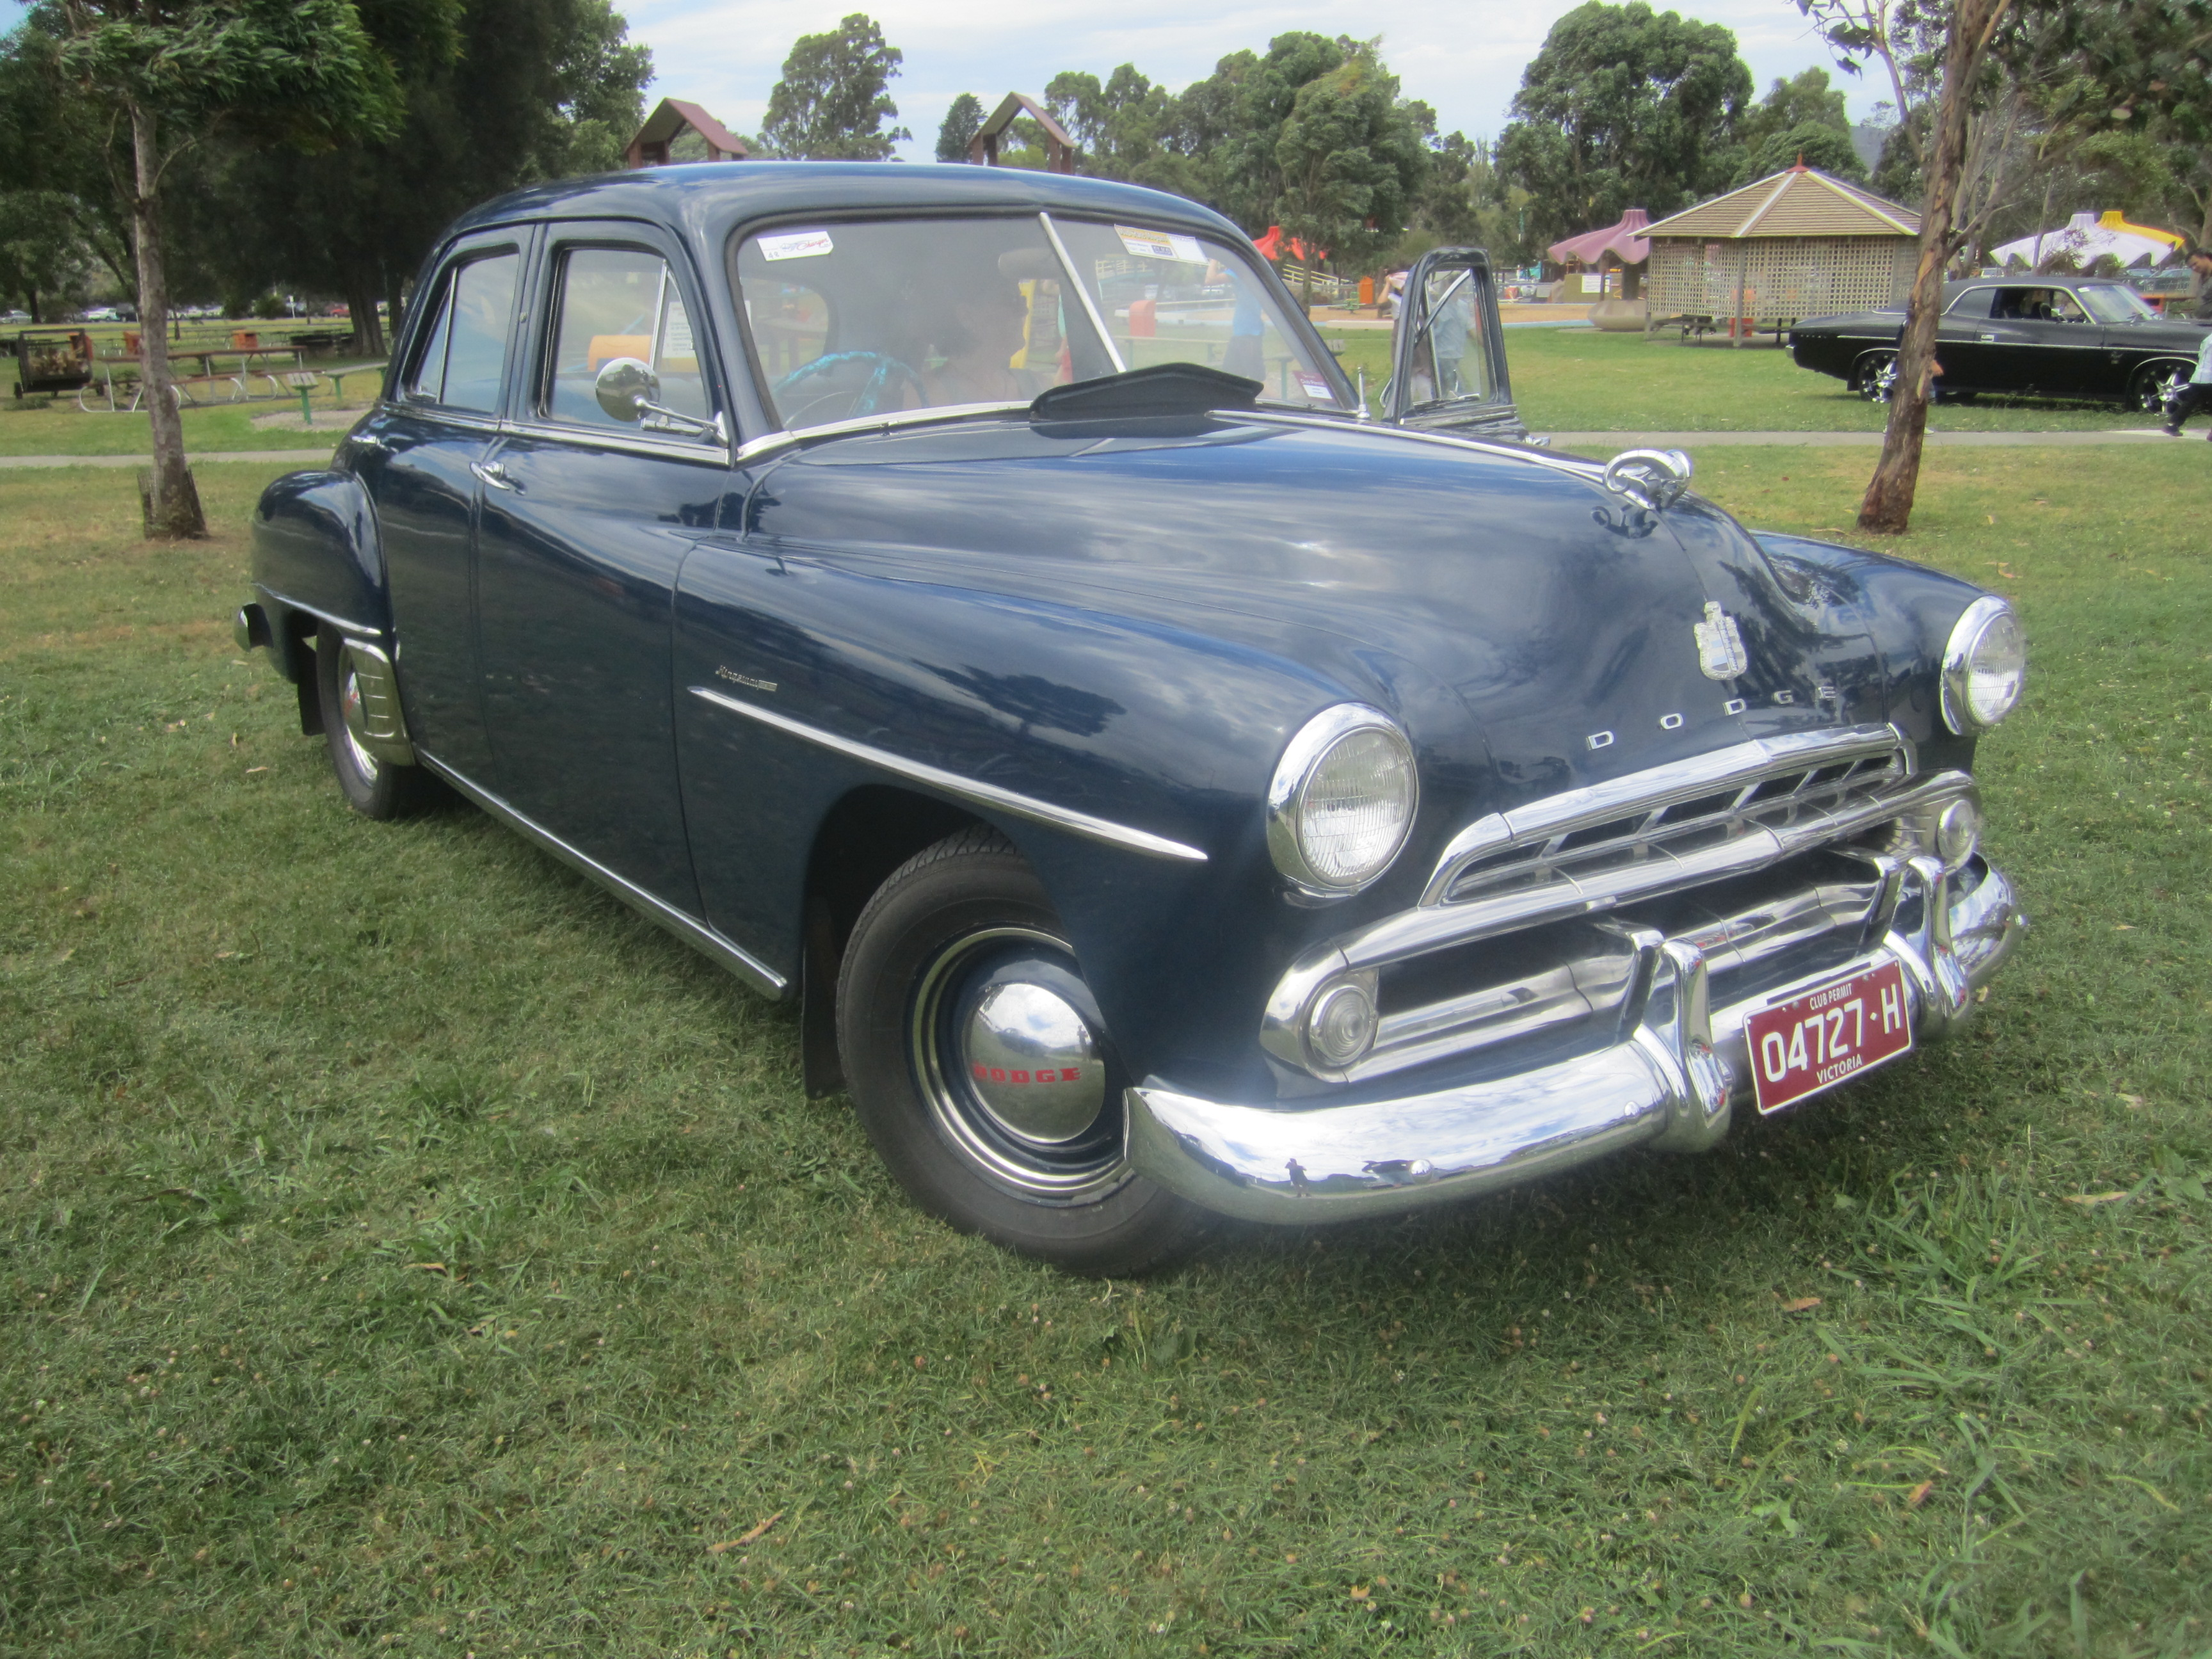 File:1952 Dodge Kingsway Sedan.jpg - Wikimedia Commons